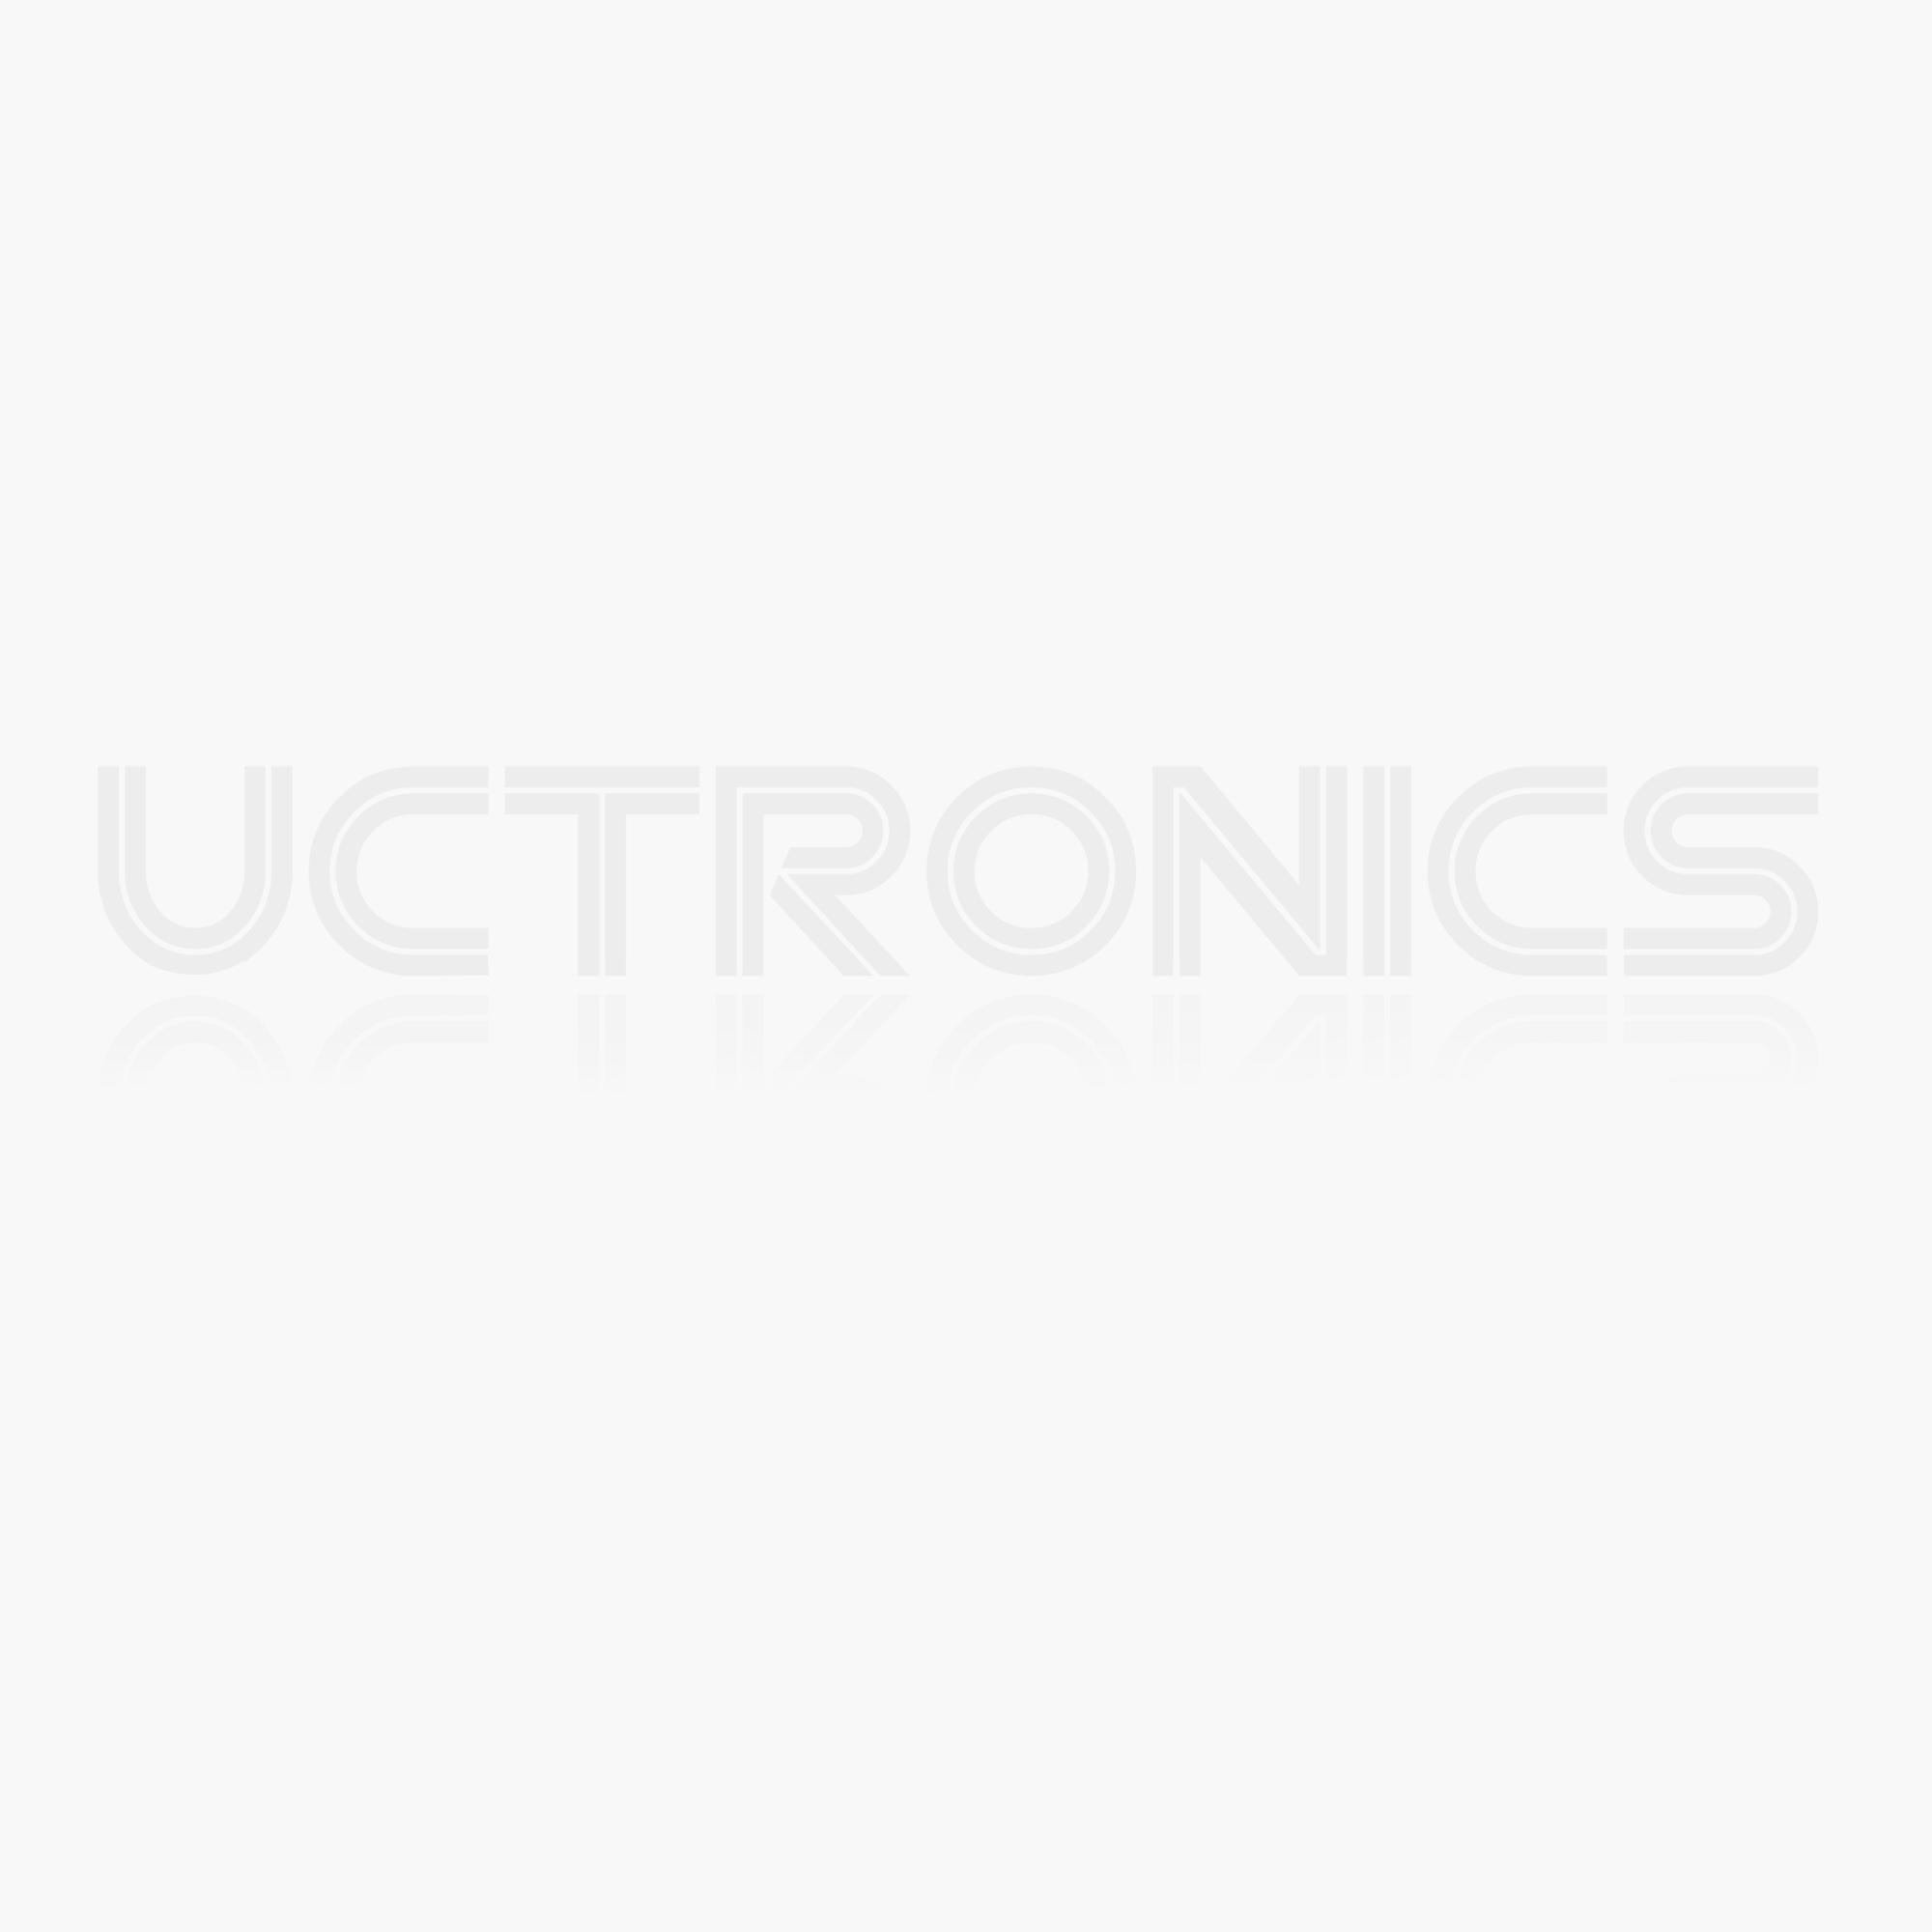 DC-DC 6-24V to 5V 3A USB Power Supply Buck Step-down Module